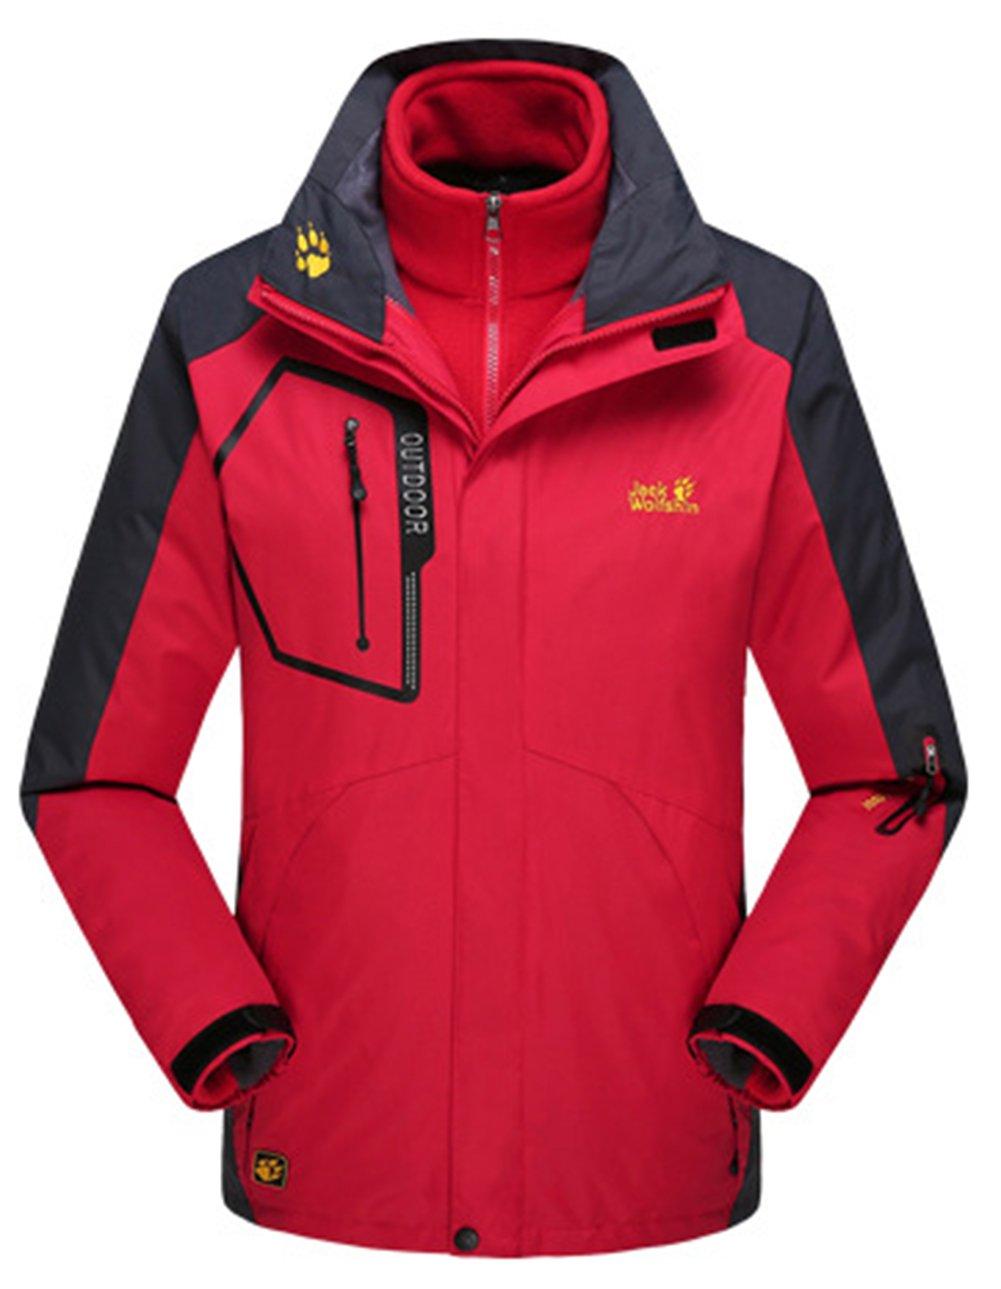 Lottaway Couple Detachable Fleece Waterproof Outdoor Snow Ski-wear Parka Coat Faddist Spark Malls-CA